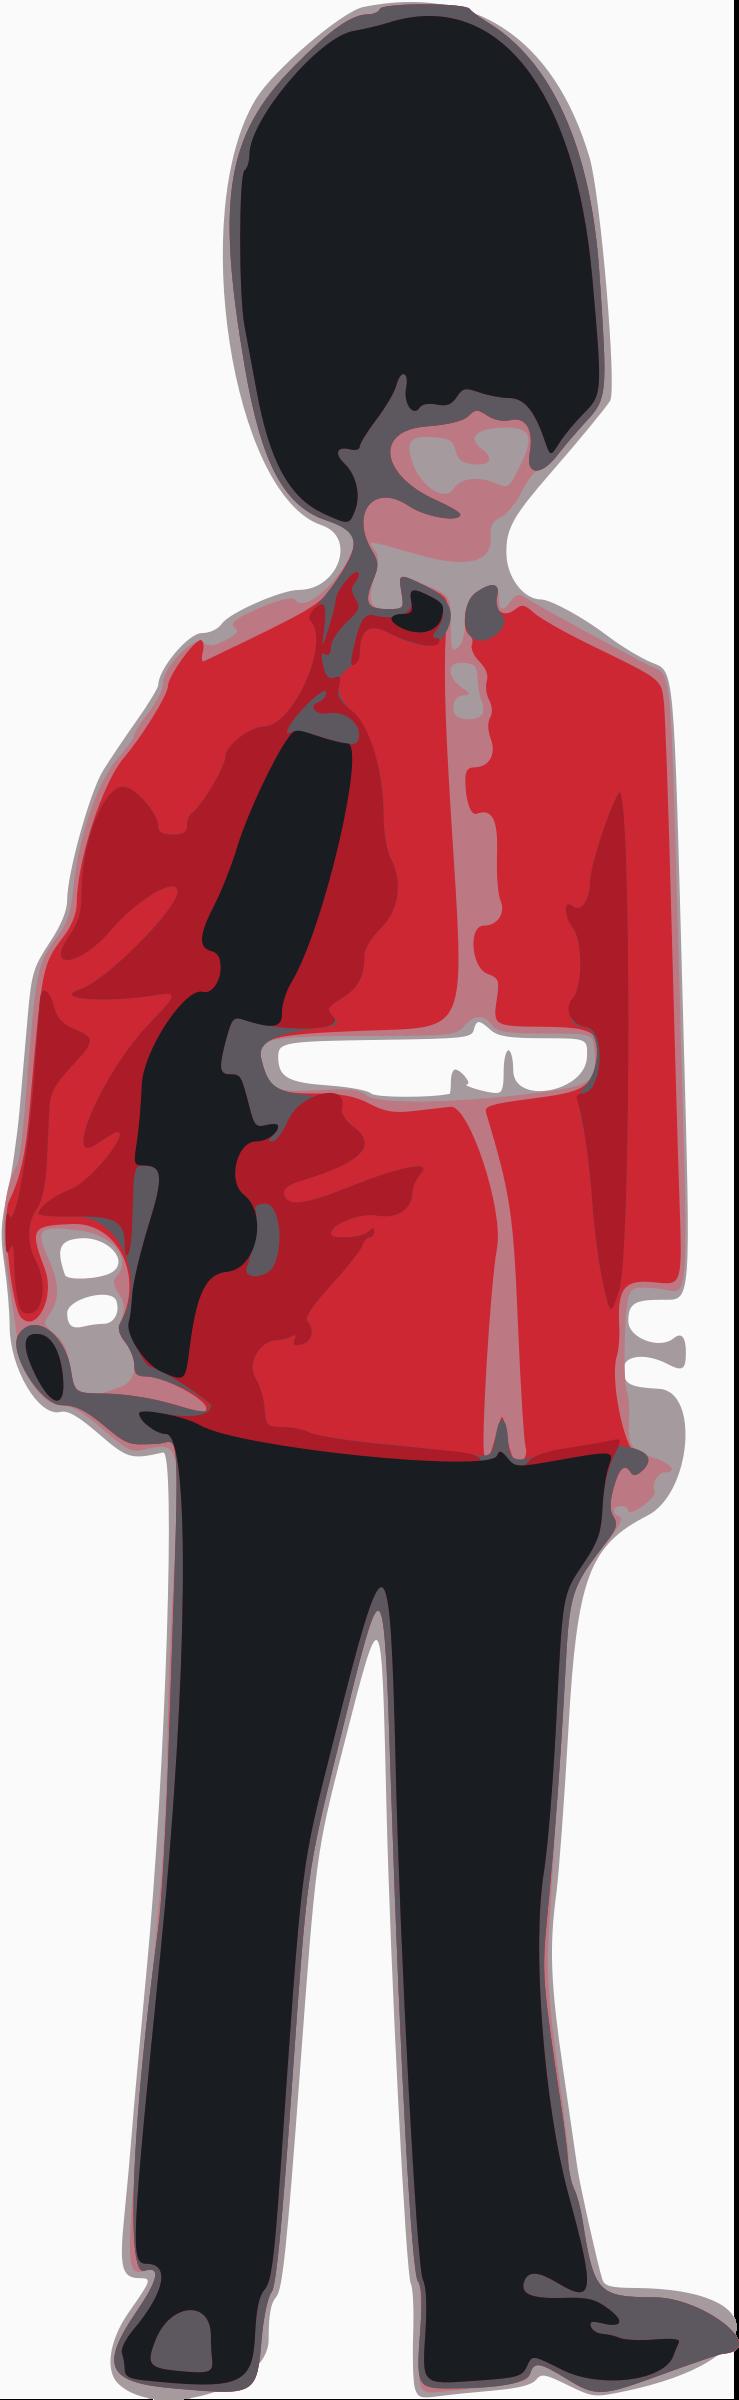 Soldier clipart britain  Free Download Clip Art